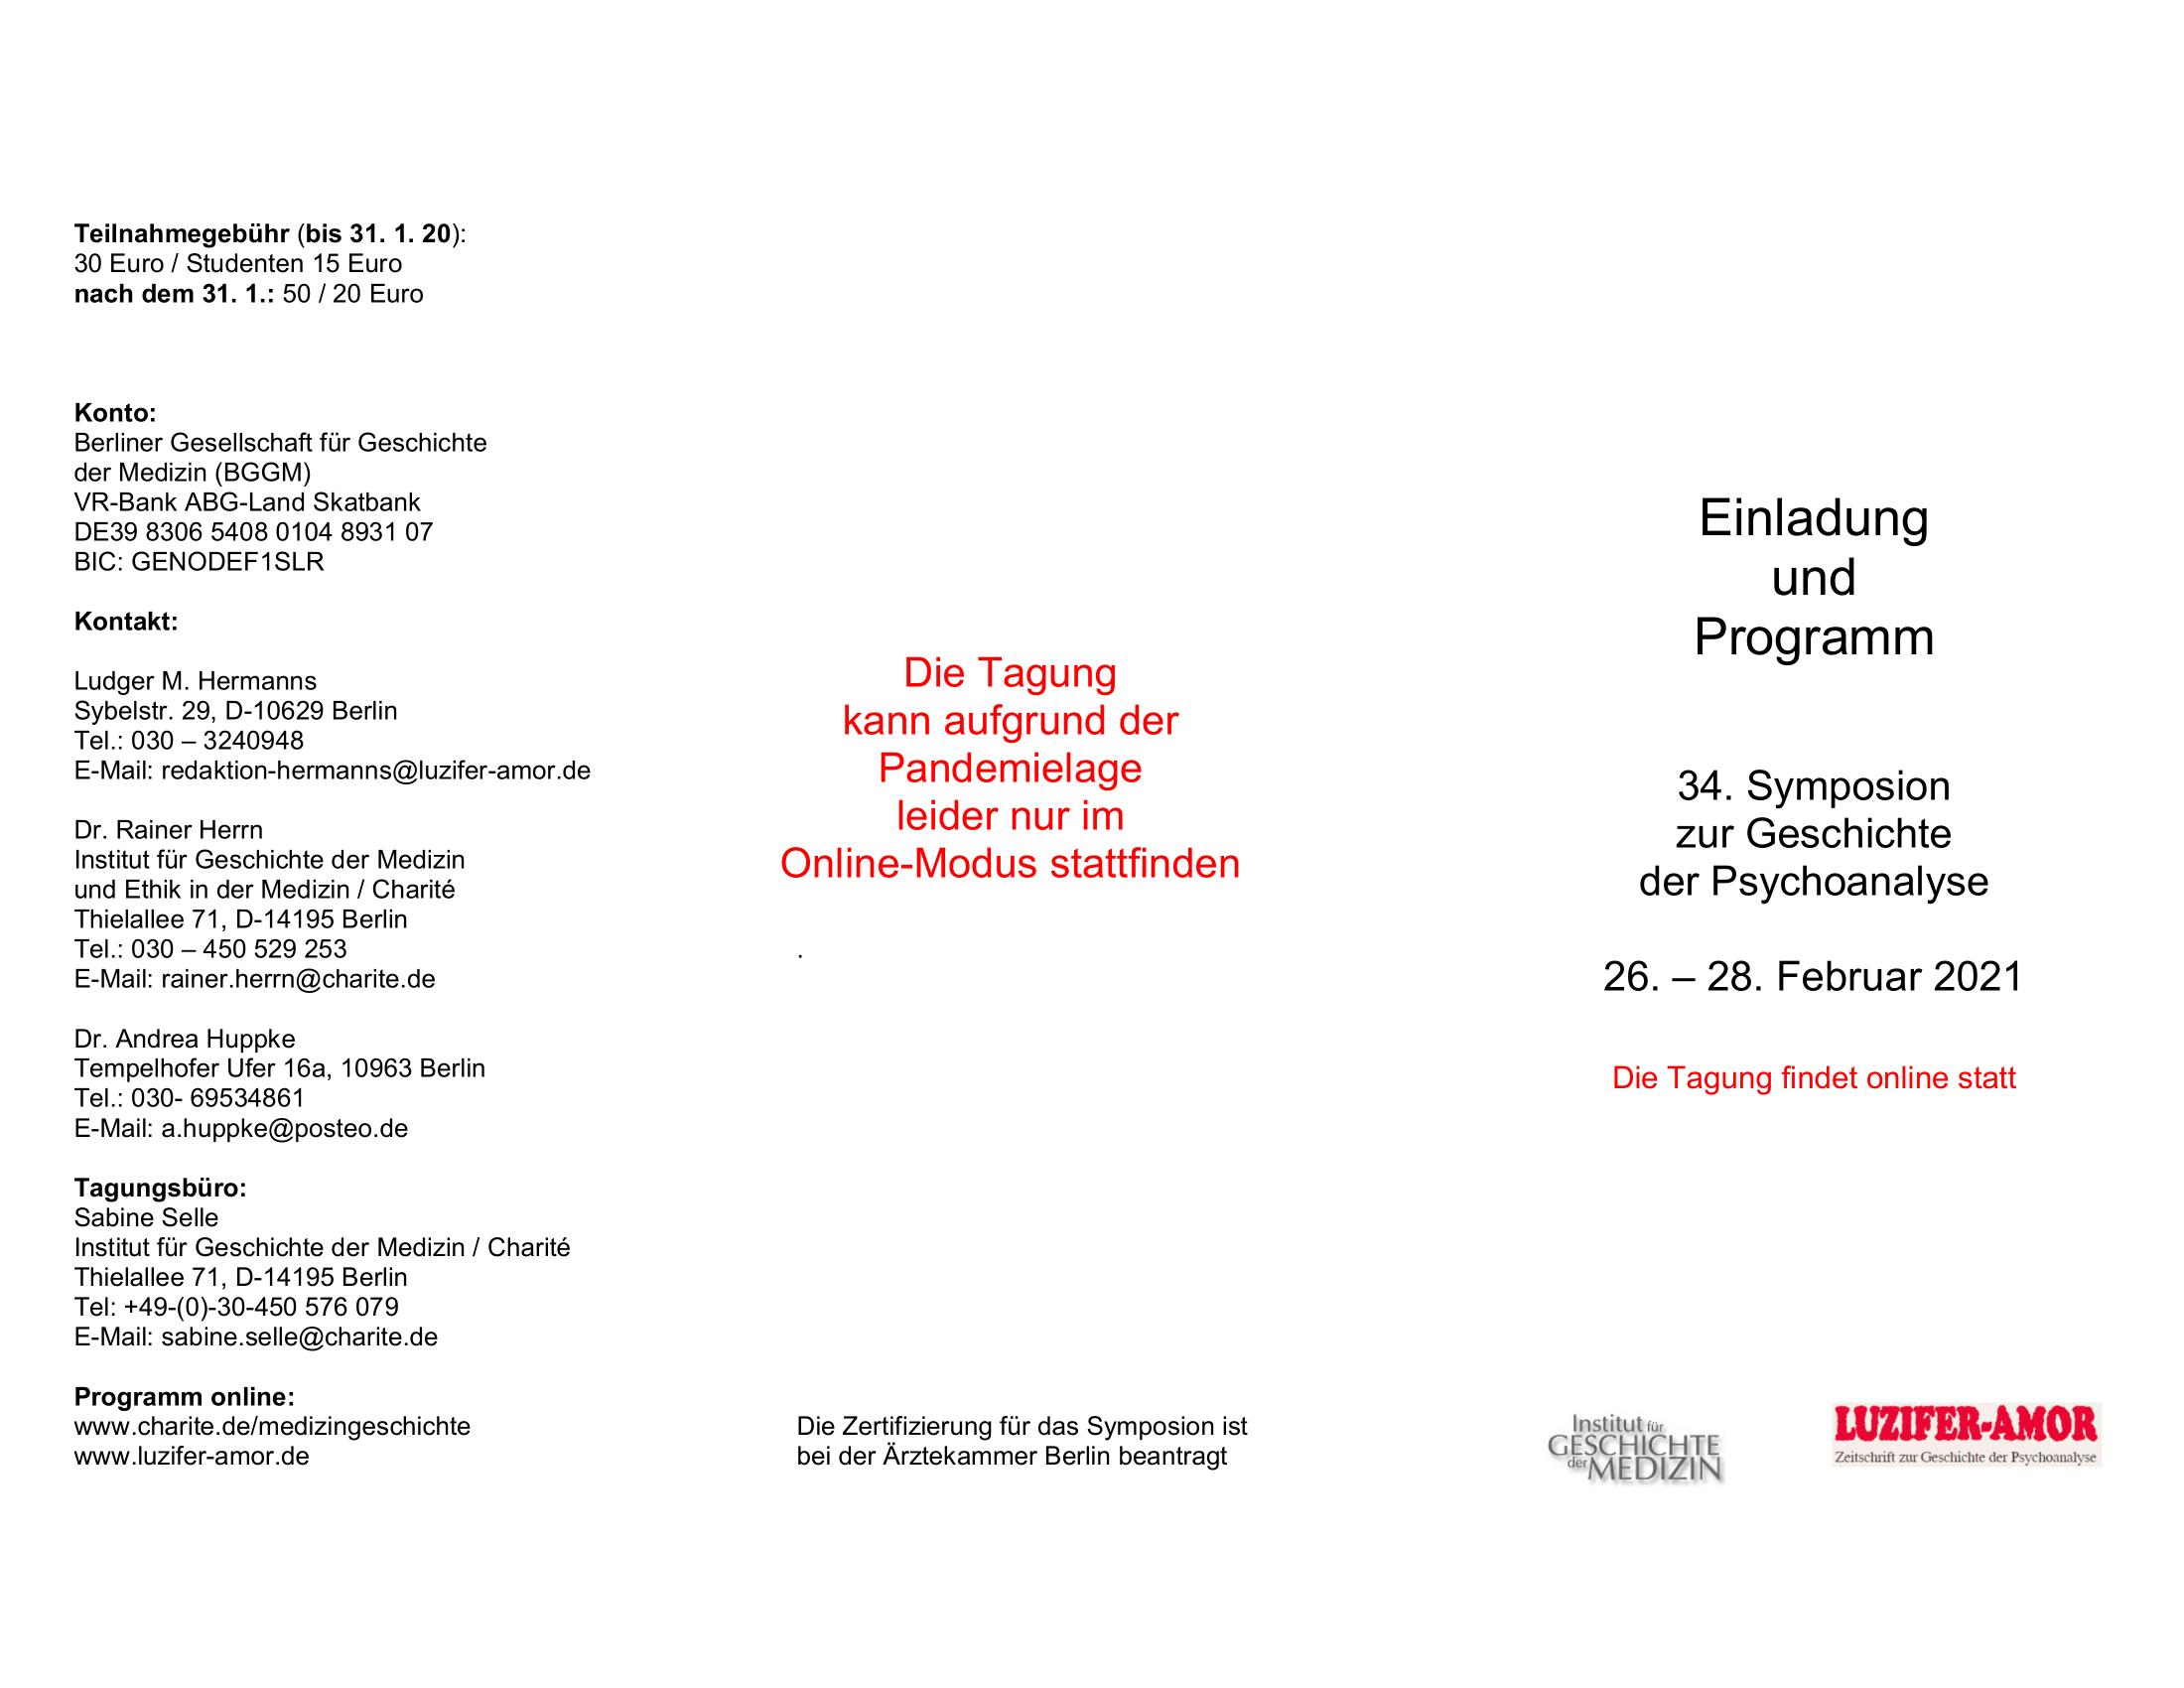 Sy34 Programm final 1